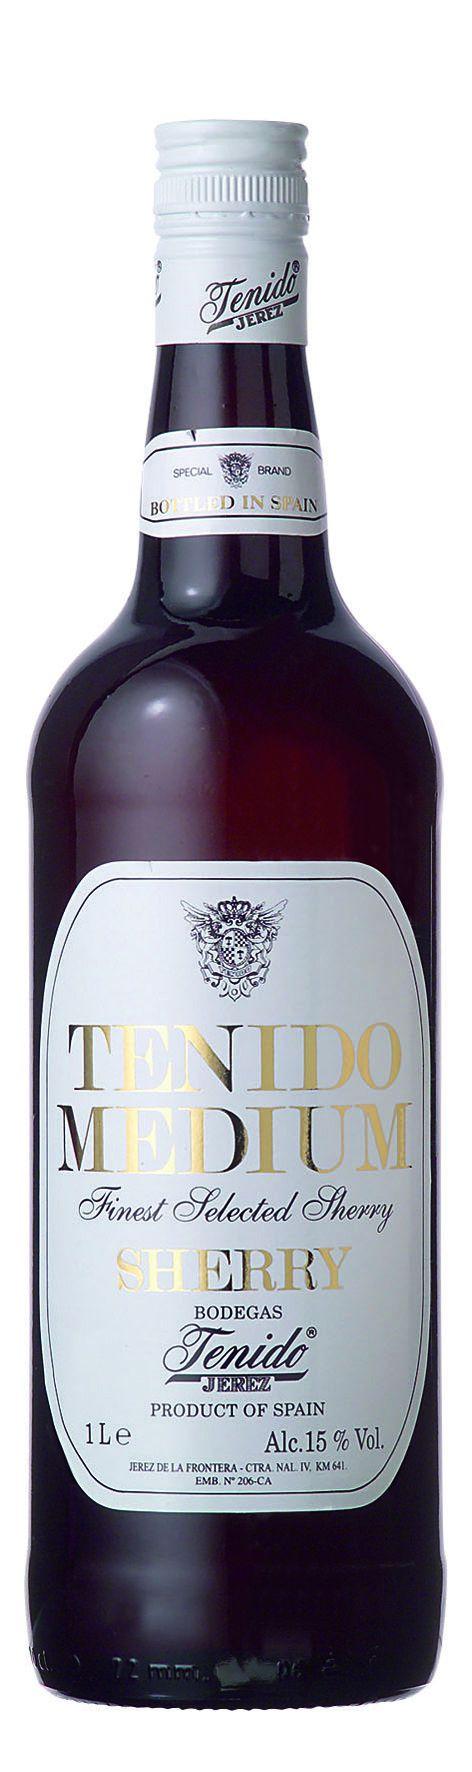 Tenido sherry medium 1 liter